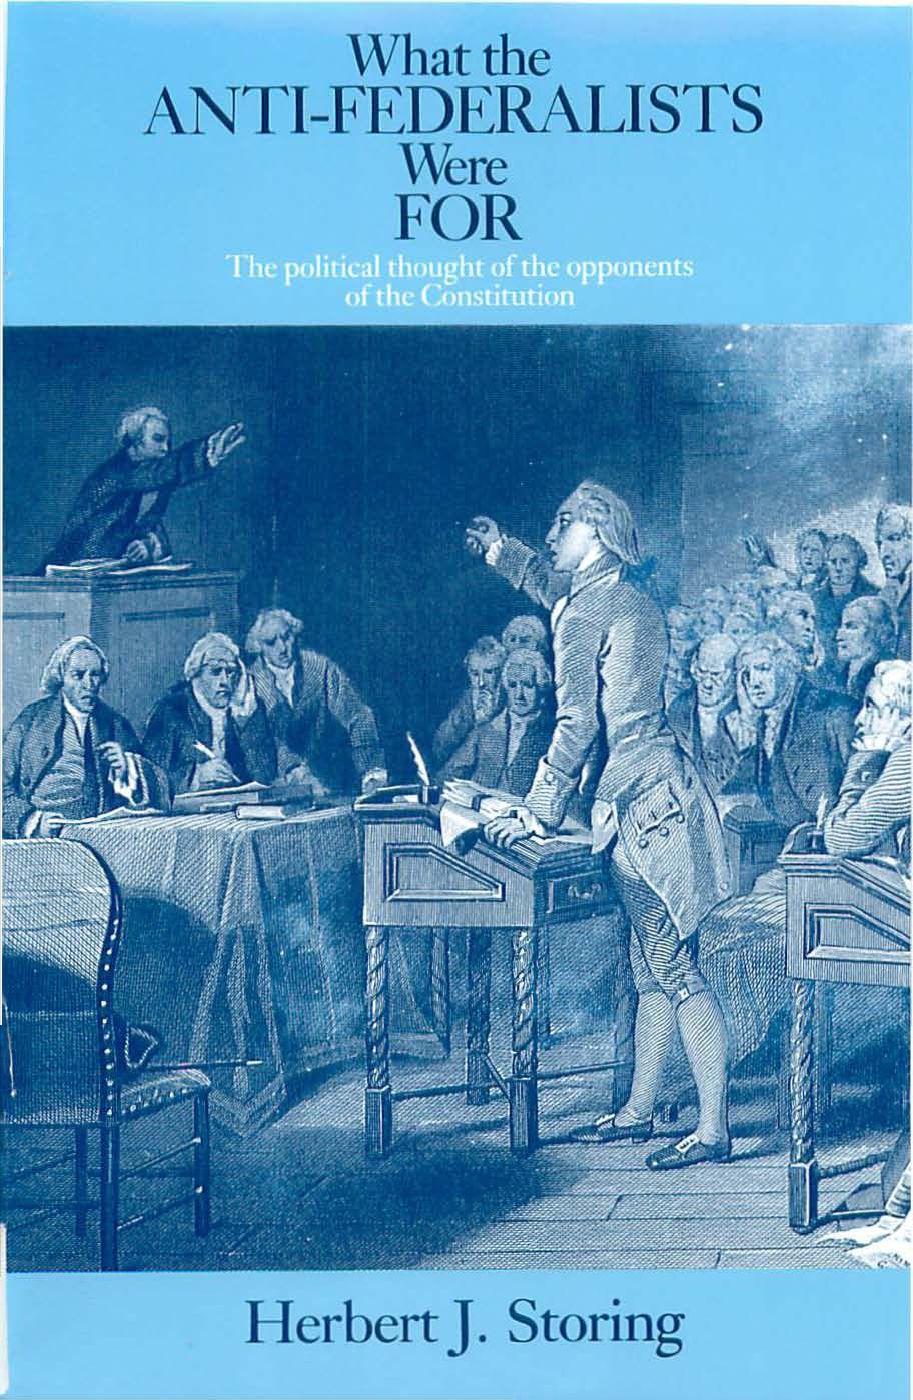 anti federalist essay signed agrippa 91 121 113 106 anti federalist essay signed agrippa chirurgie esthtique au maroc